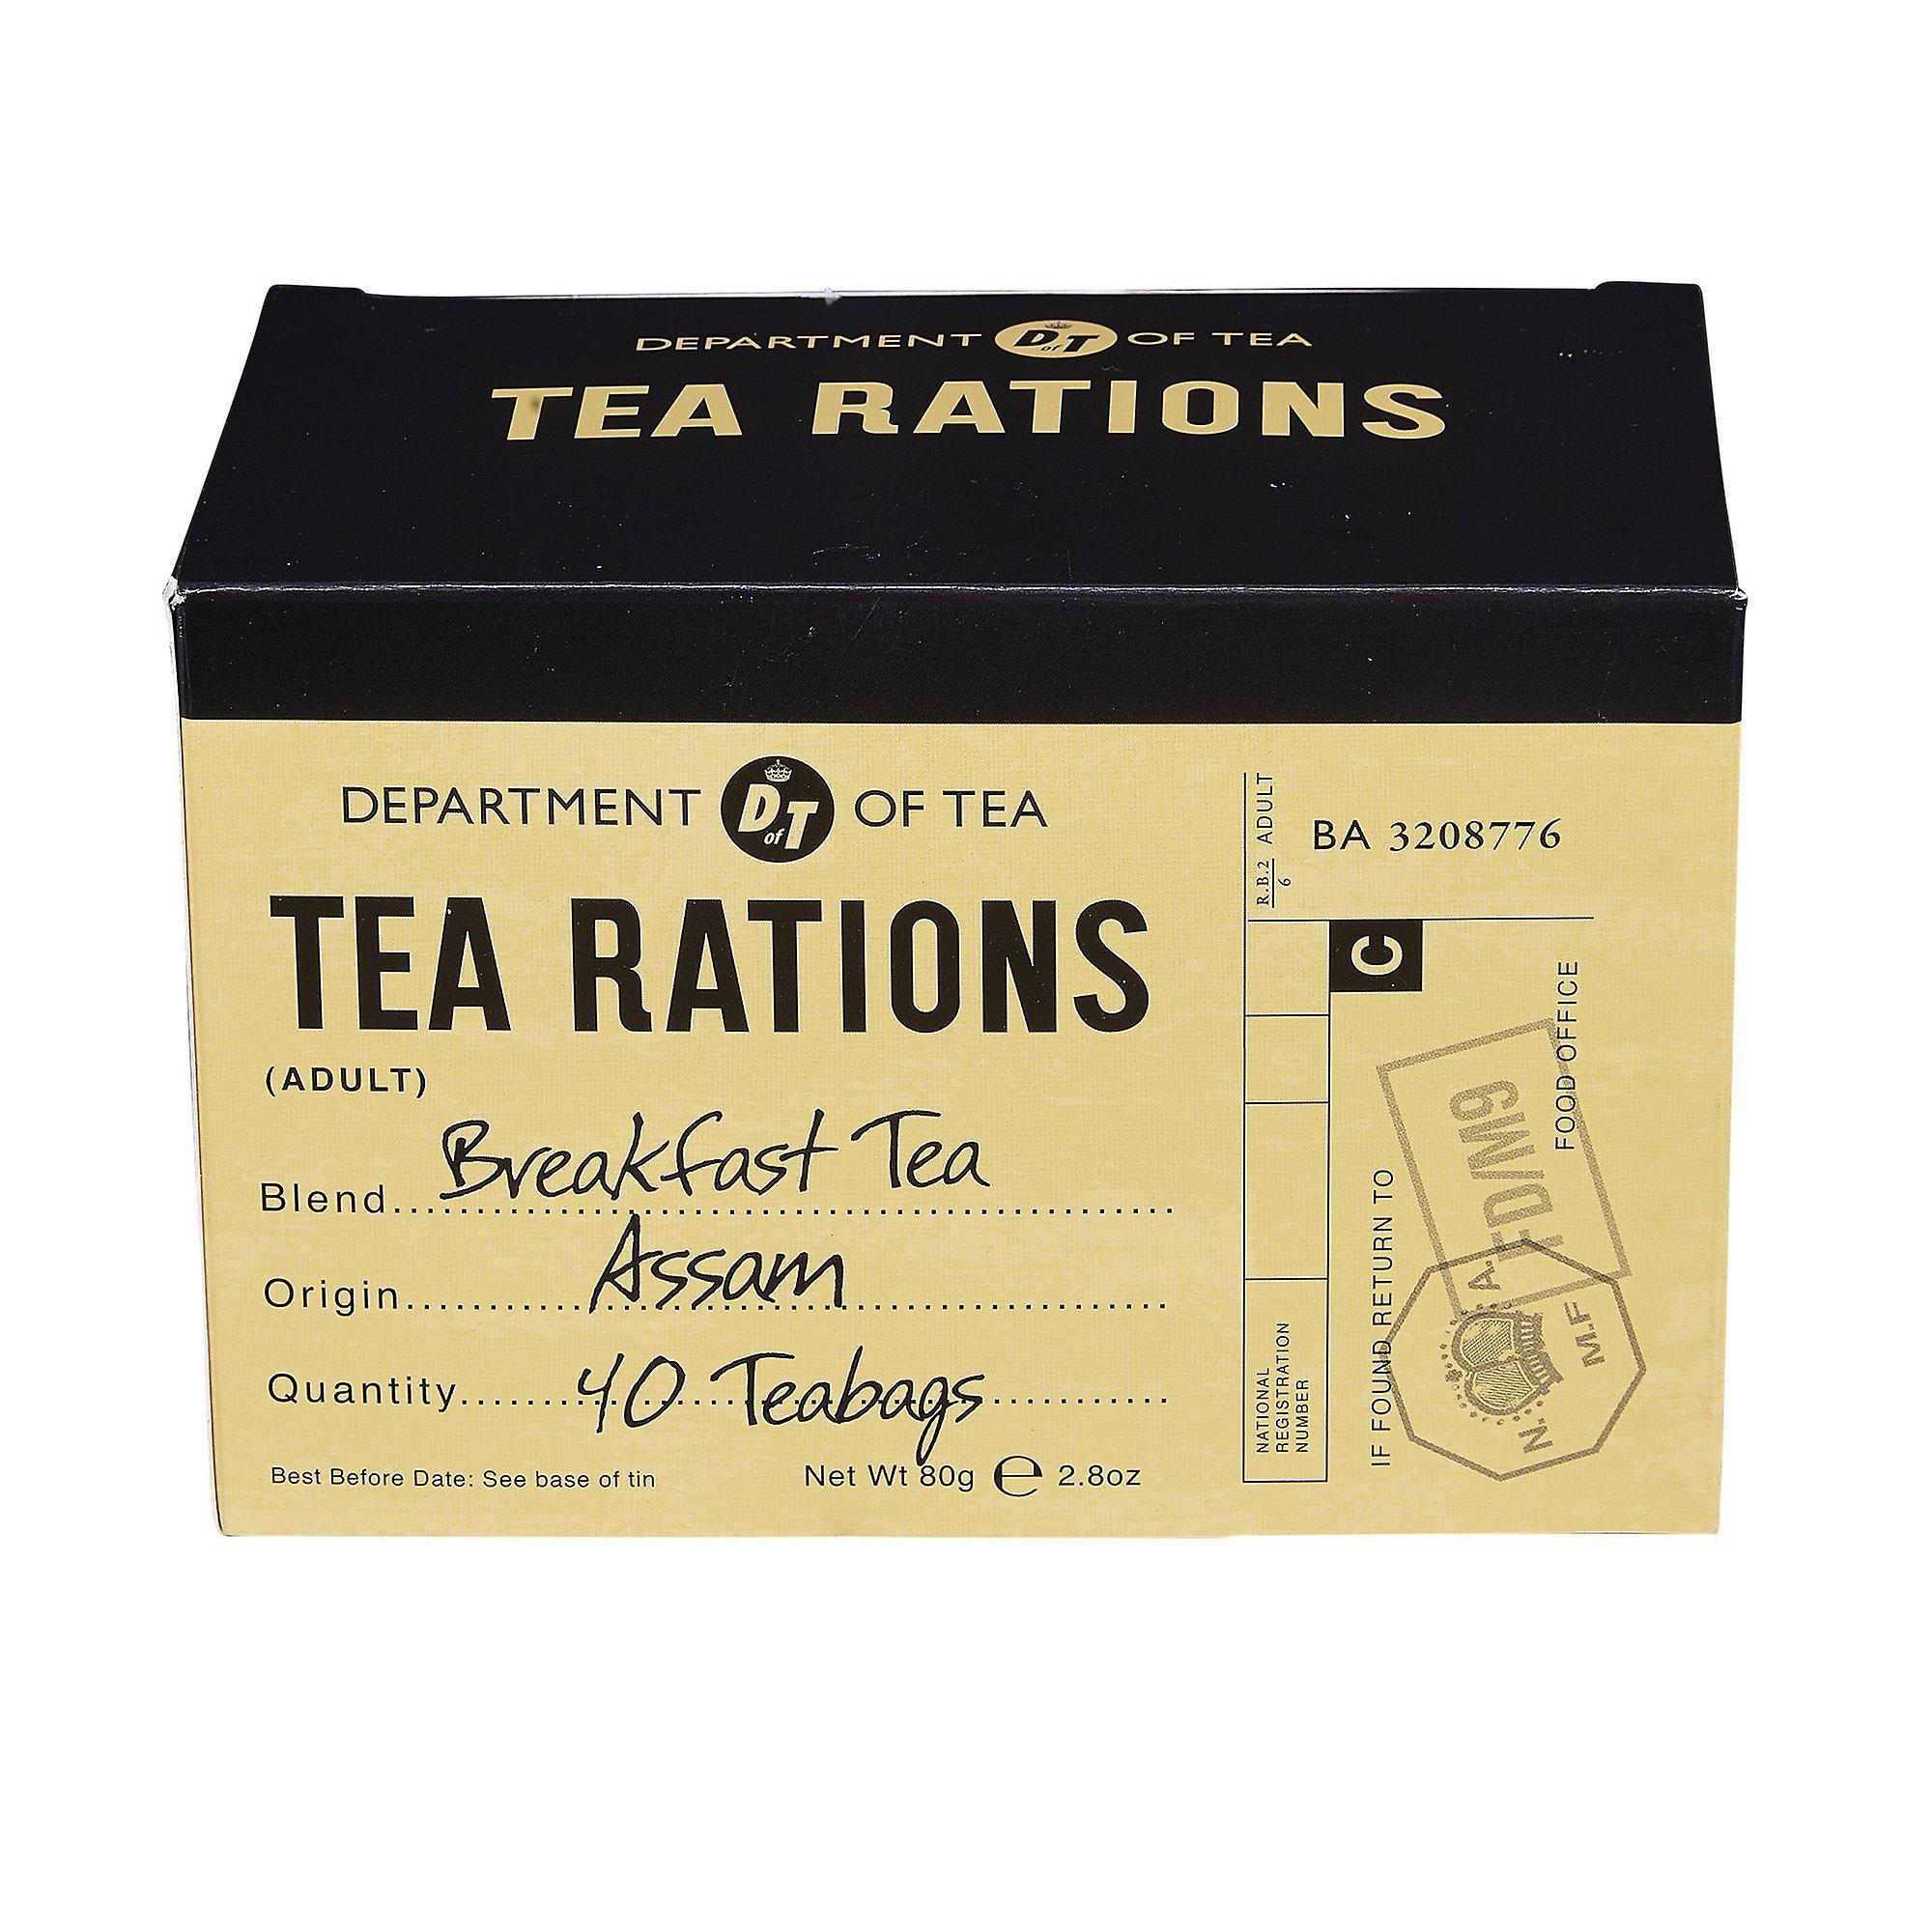 War time memories english breakfast tea rations 40 teabag carton